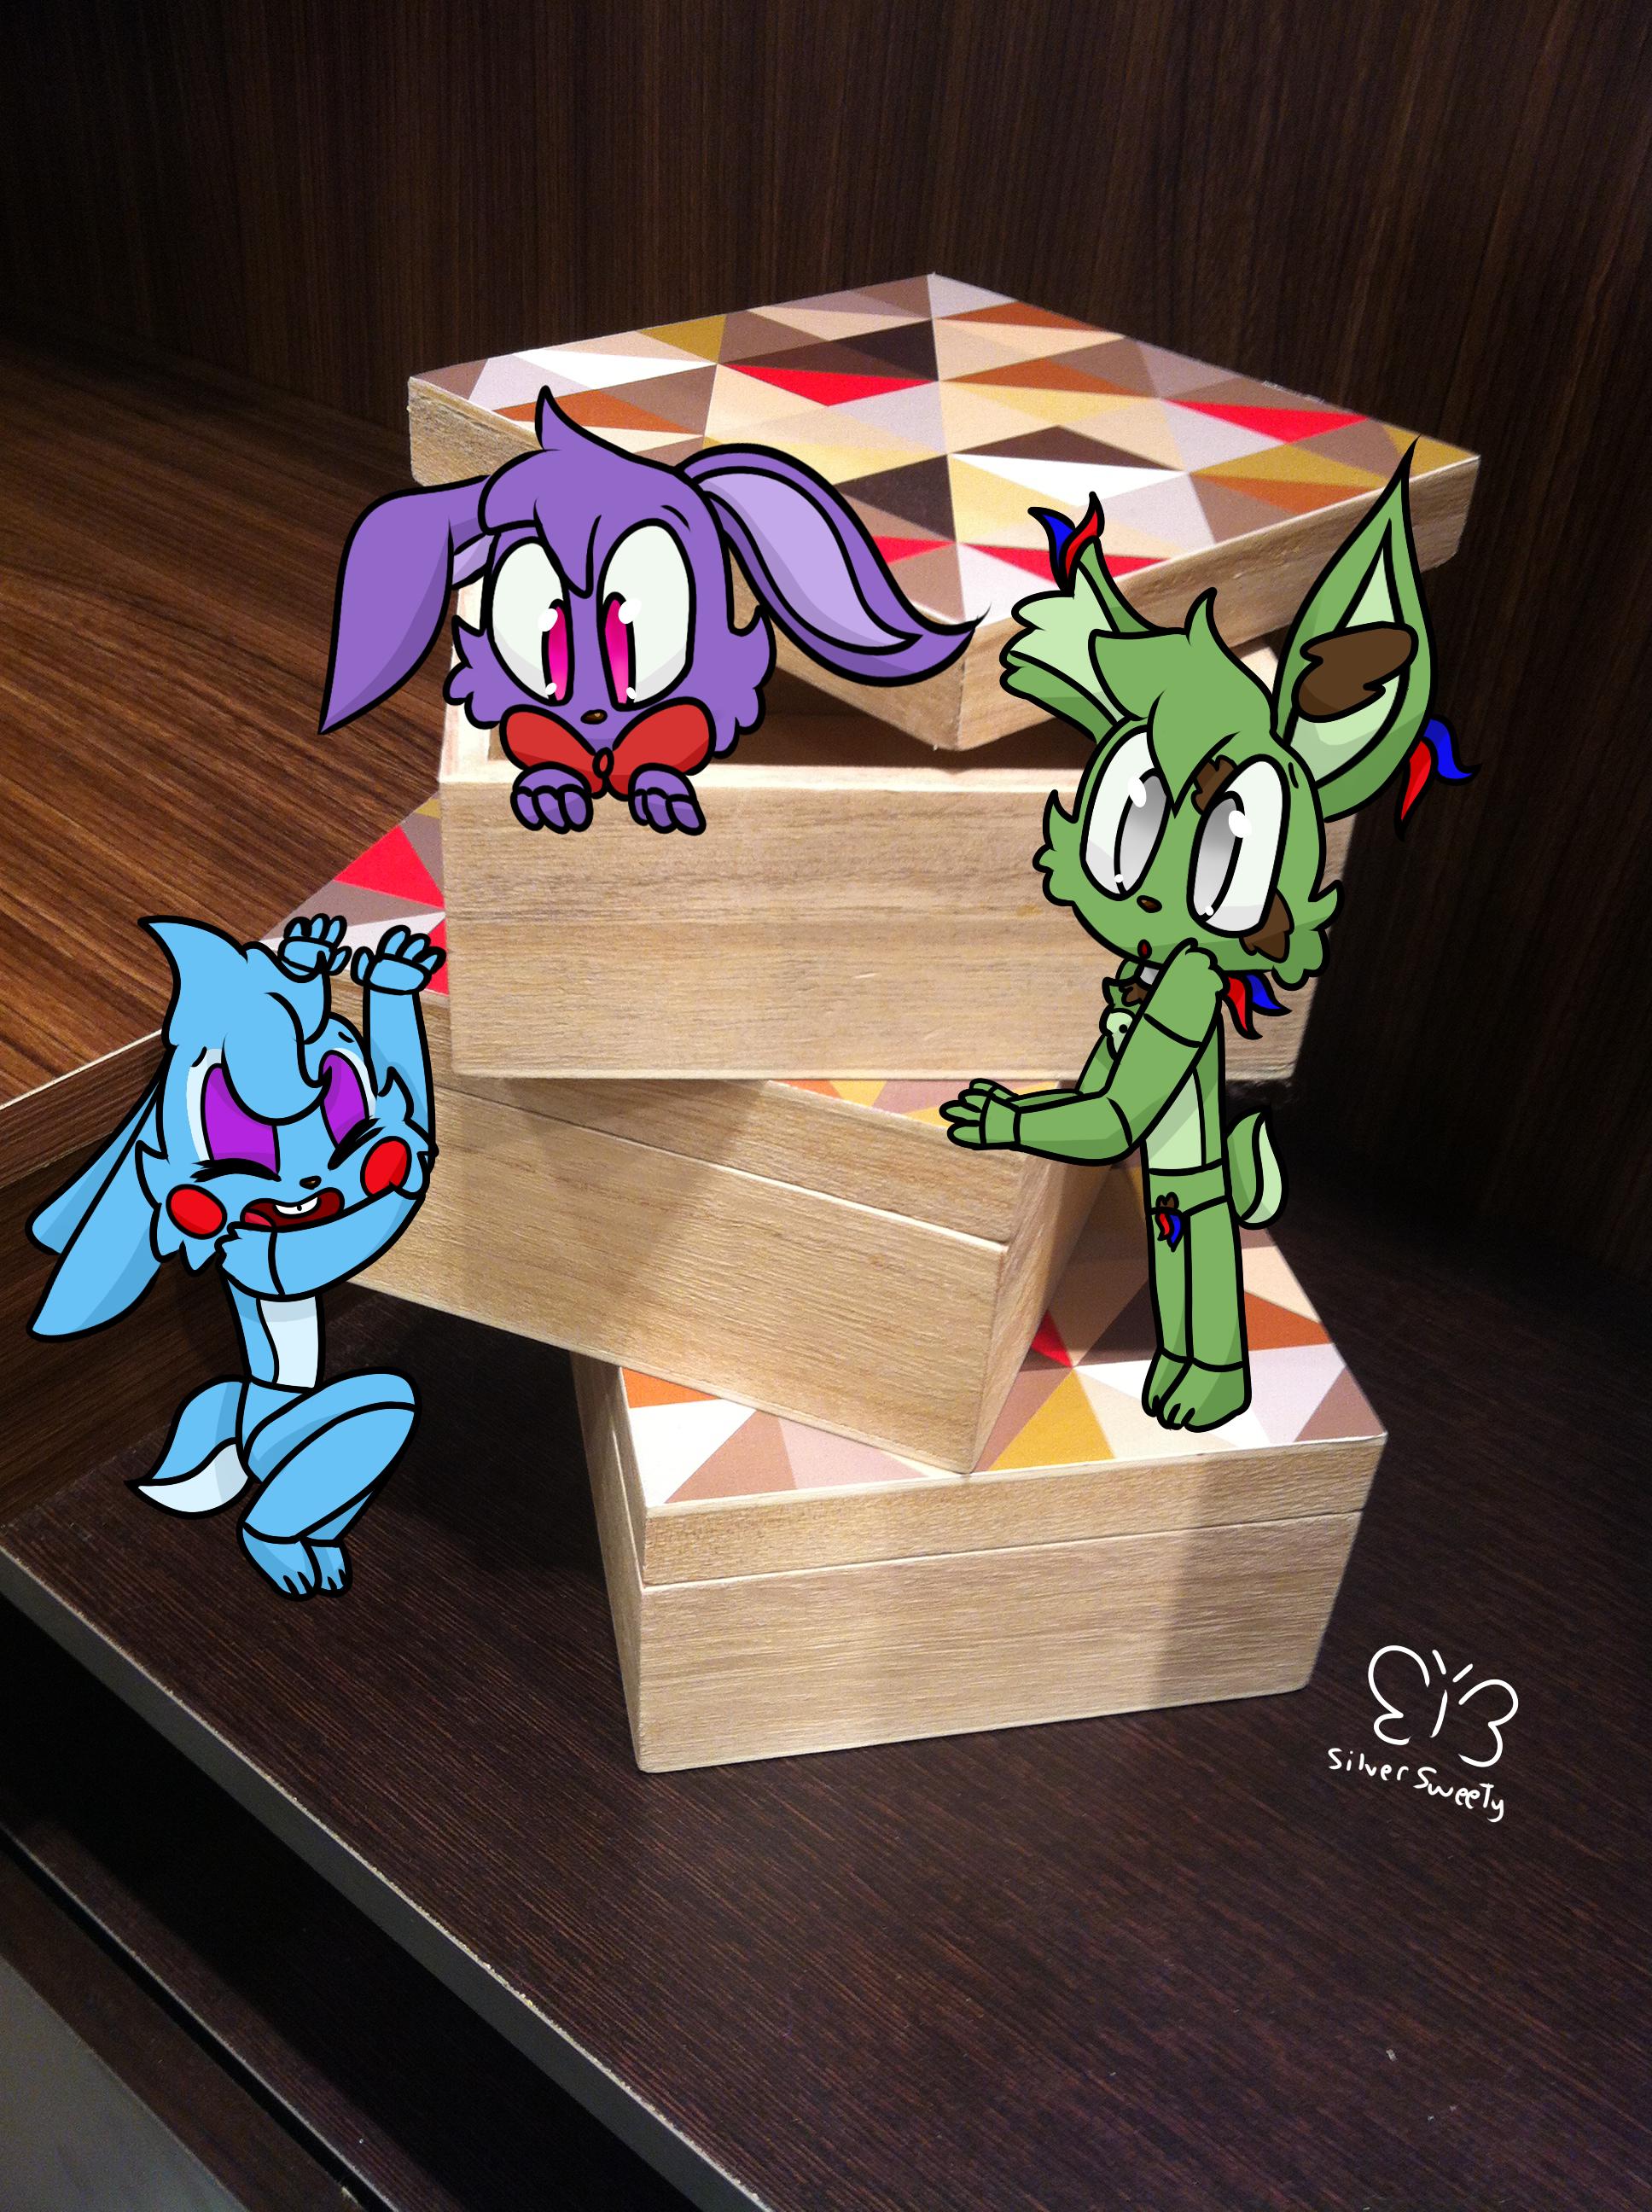 FNAF] Real life + Digital #1: Bunnies on the box! by